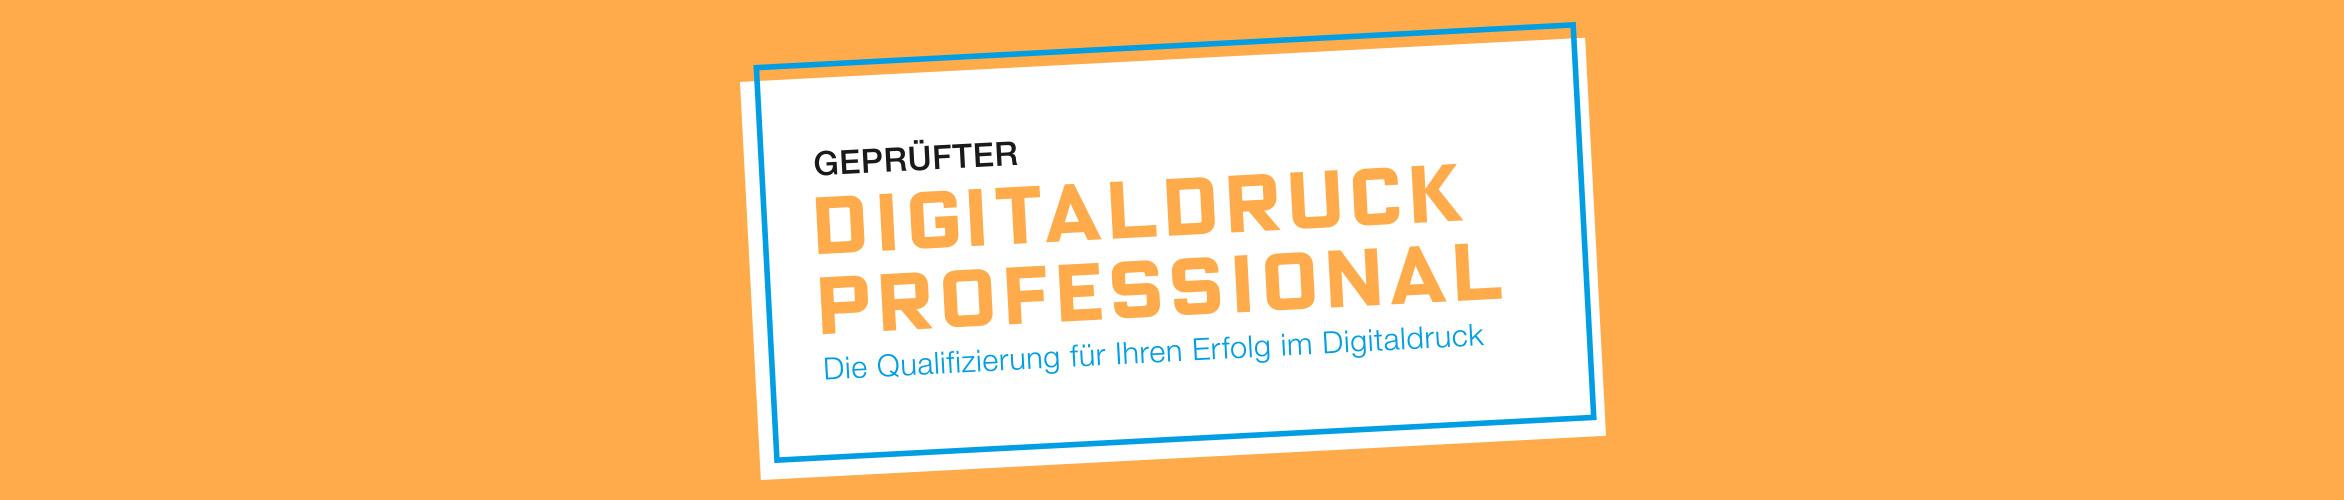 Geprüfter Digitaldruck-Professional